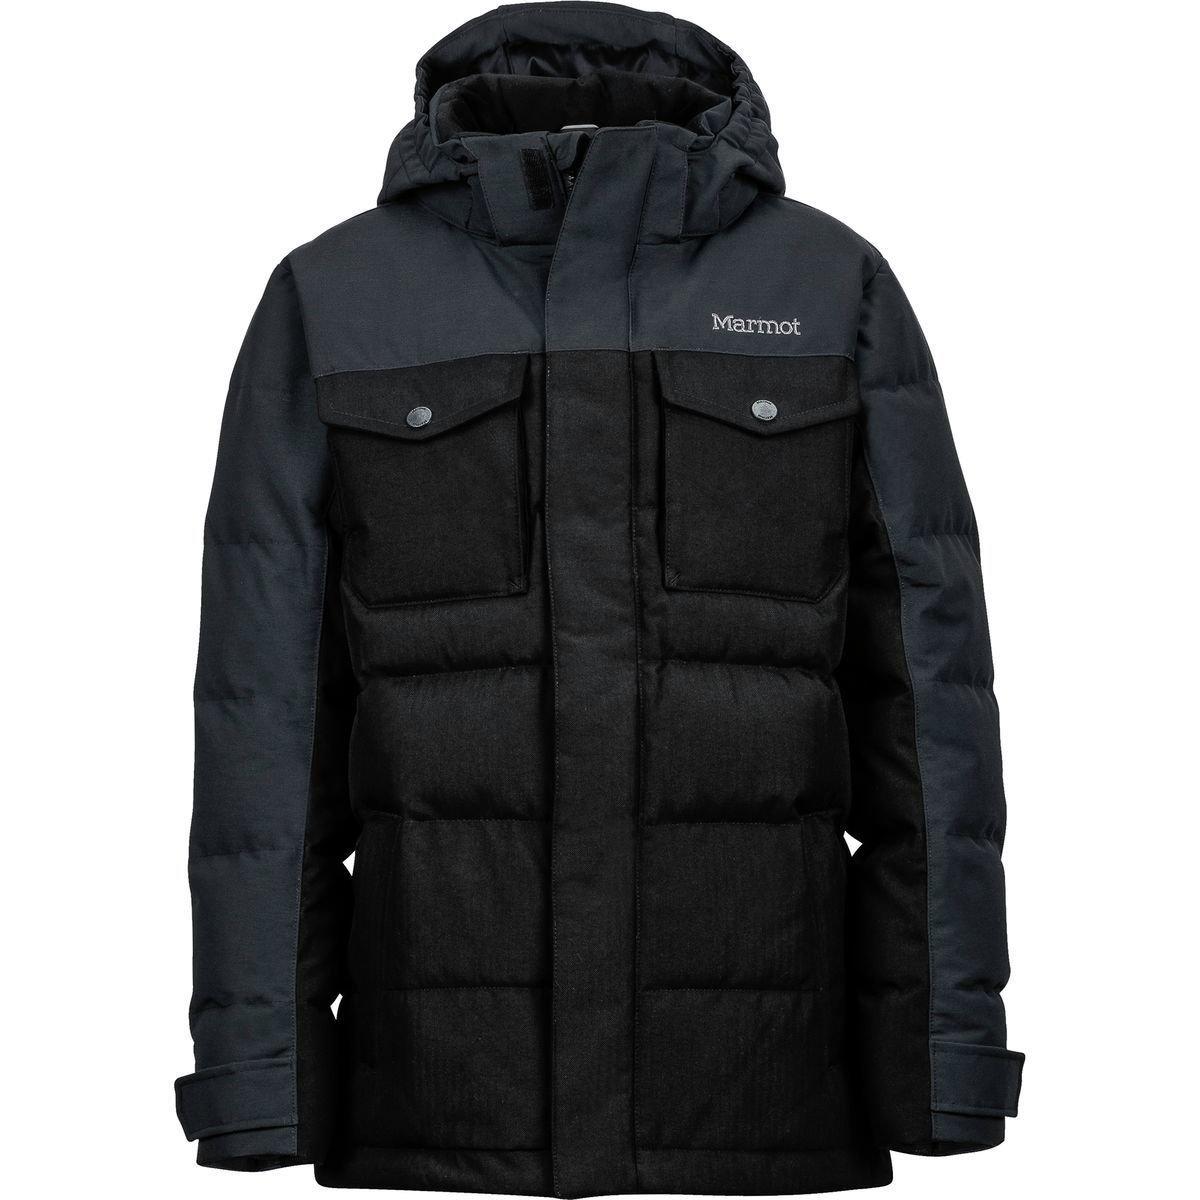 Marmot boys Fordham Jacket 73410-001_L - Black